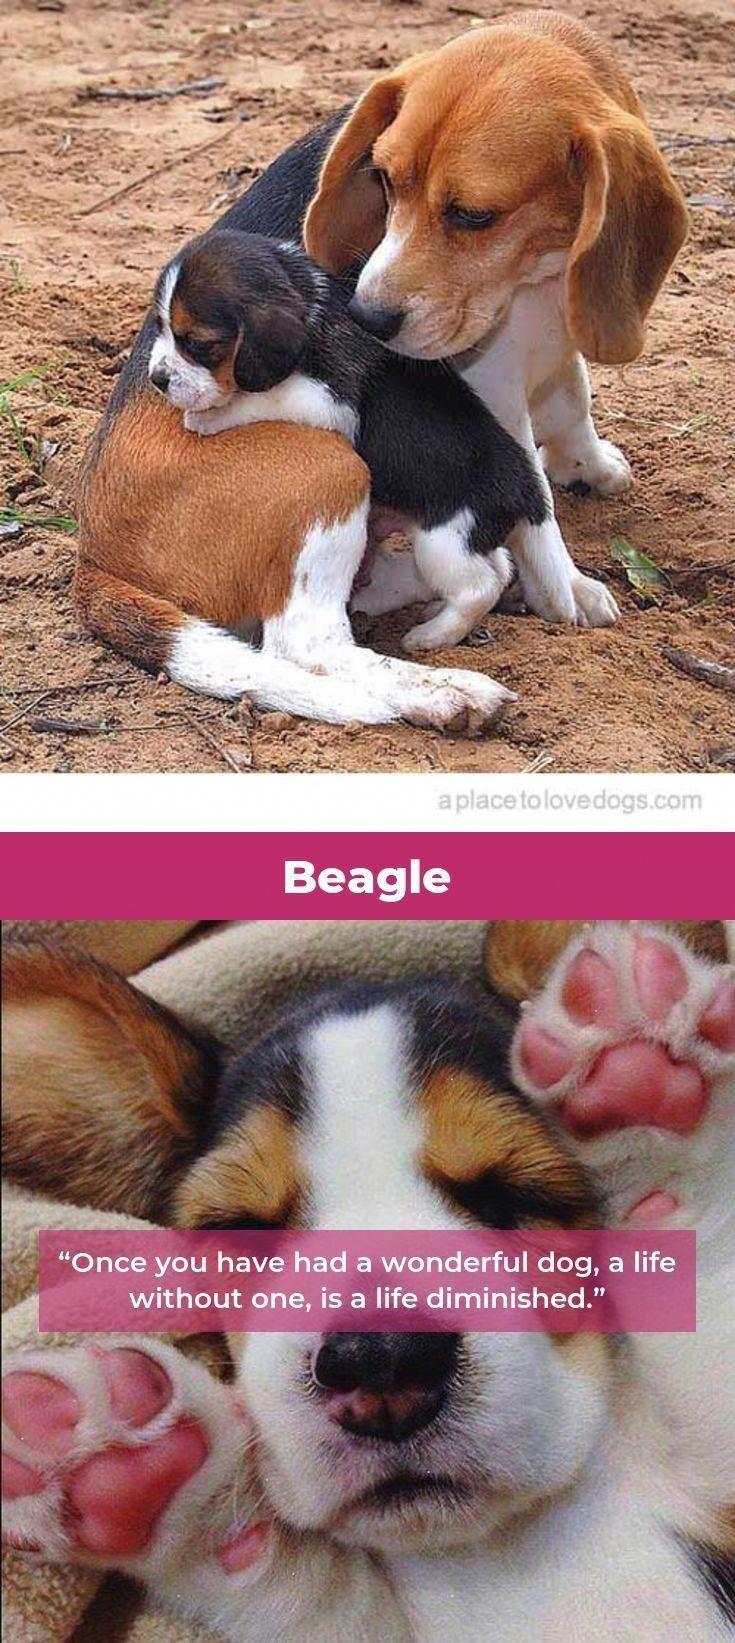 Beagle Dogs Beagle Dogs Beagle Dog Cute Beagles Beagle Puppy